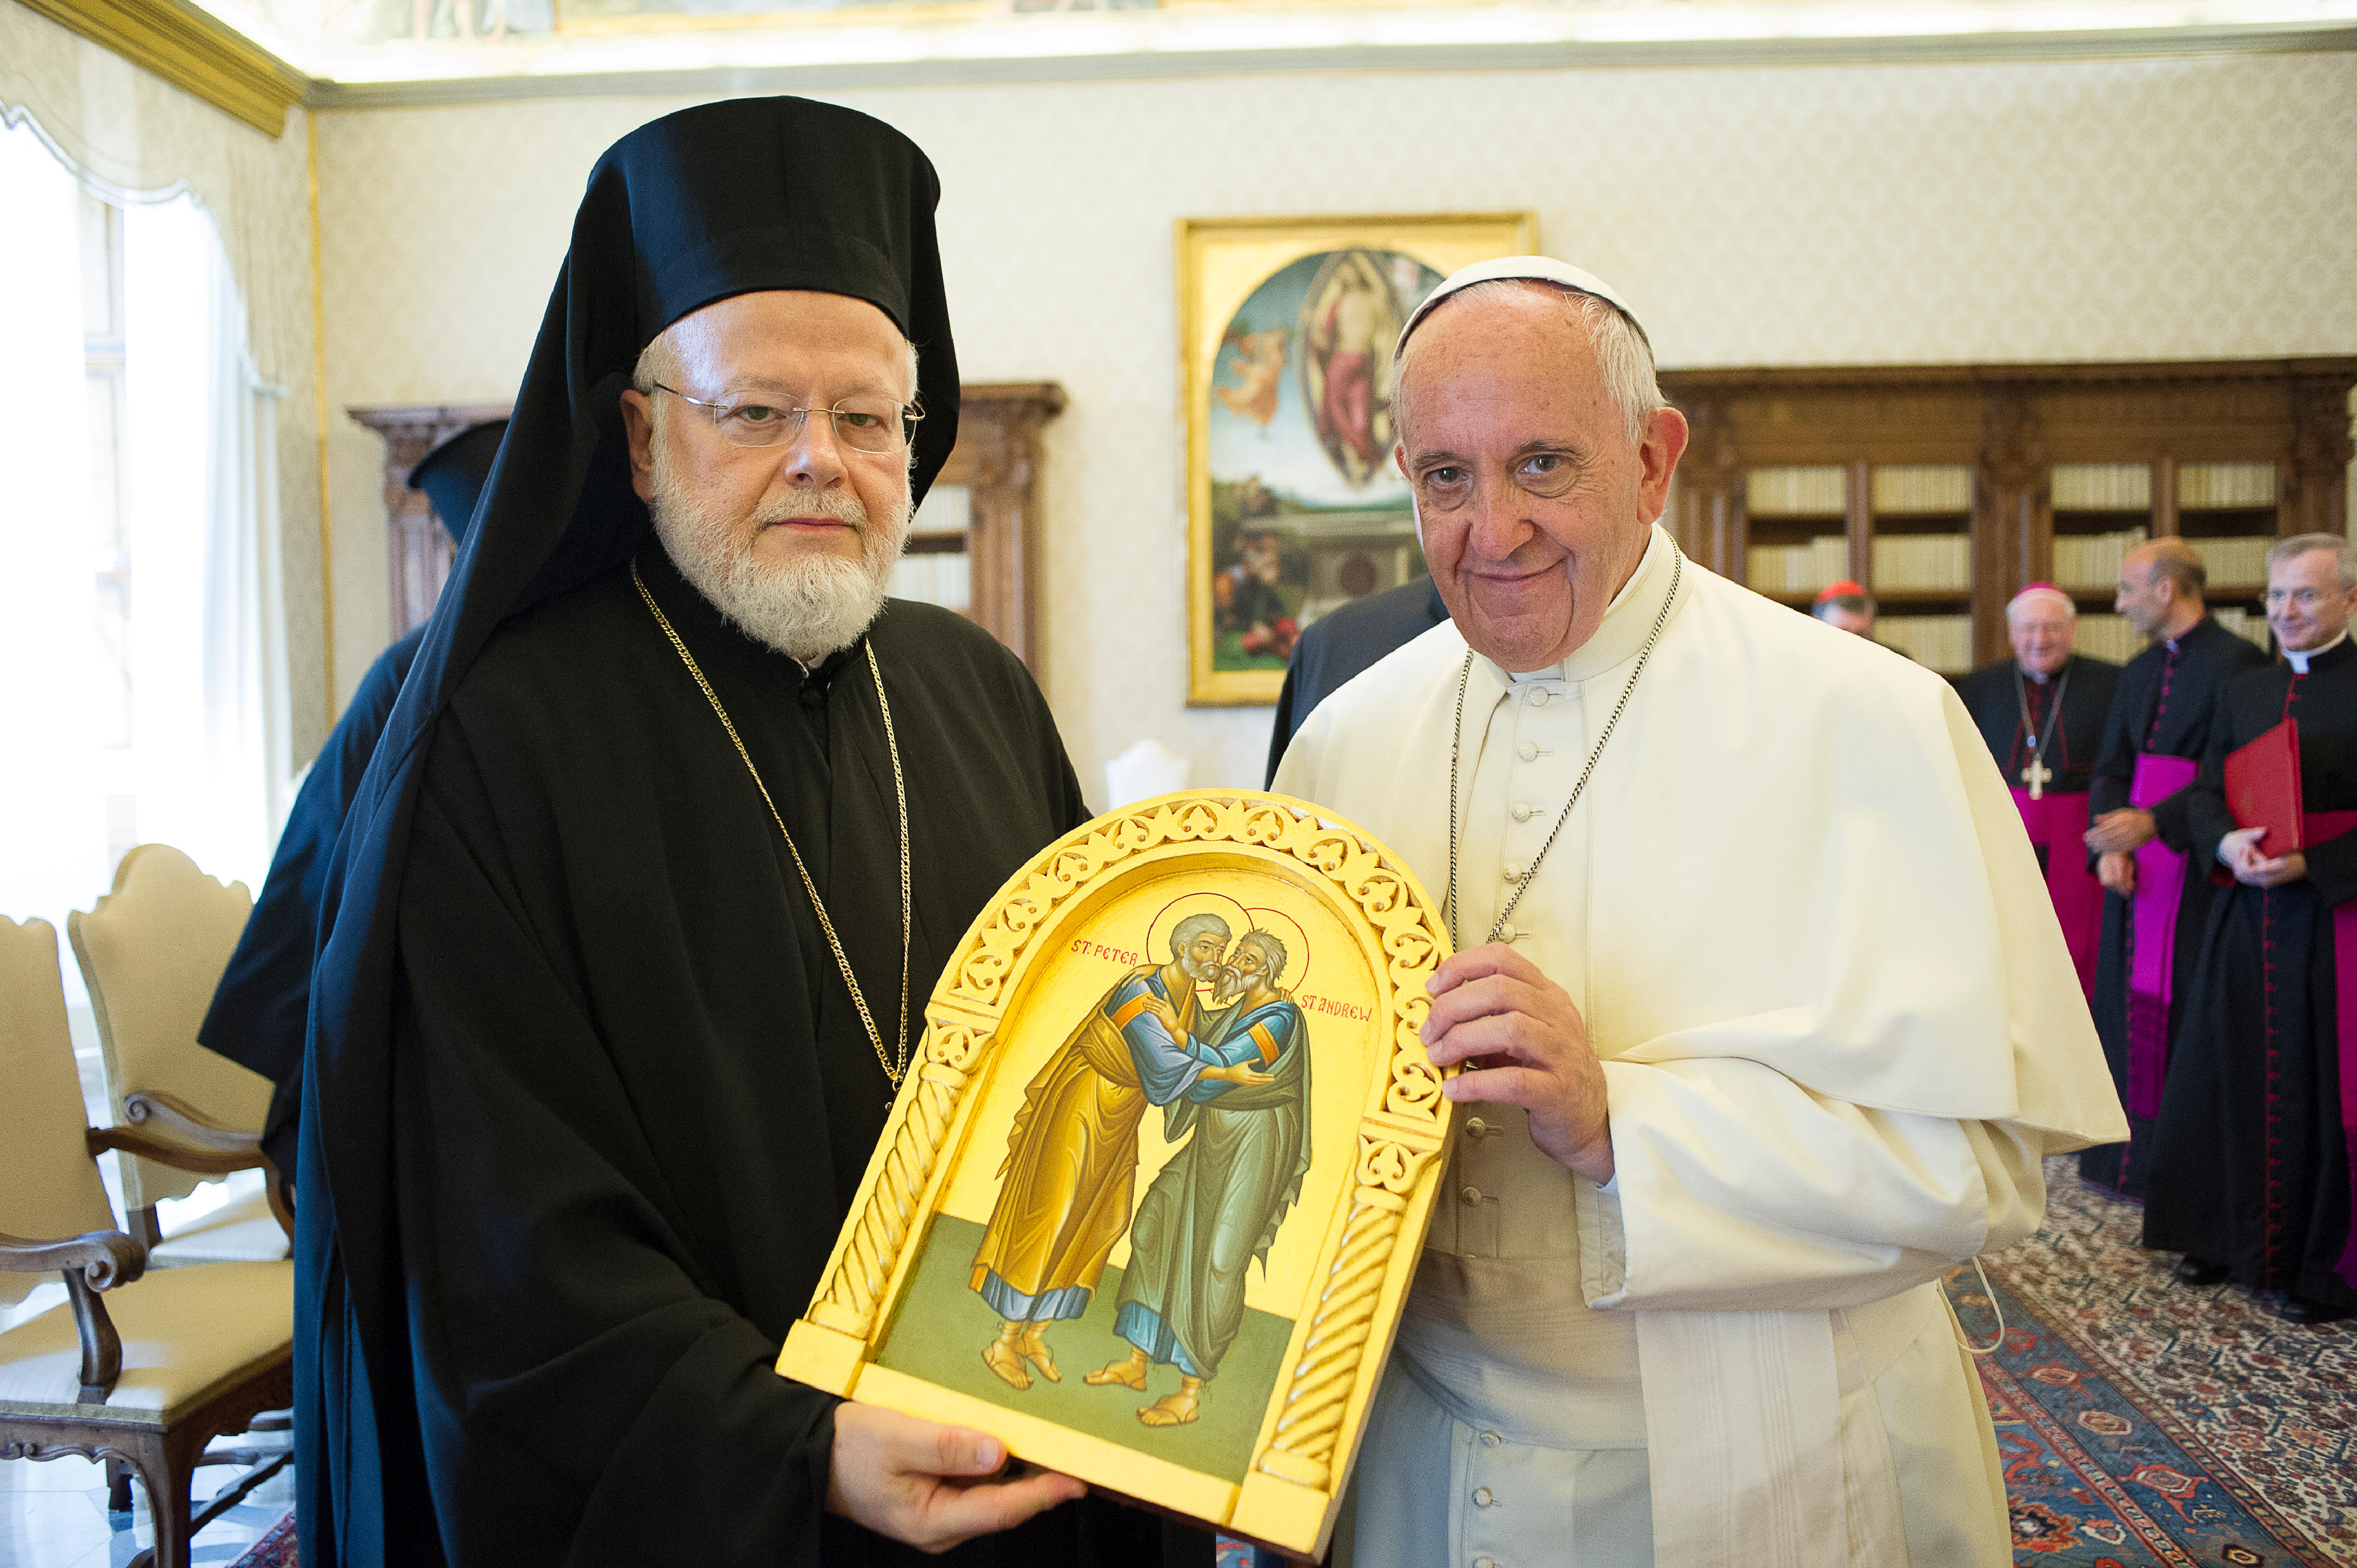 Visite du métropolite Methodios de Boston, 28 juin 2016 (c) L'Osservatore Romano